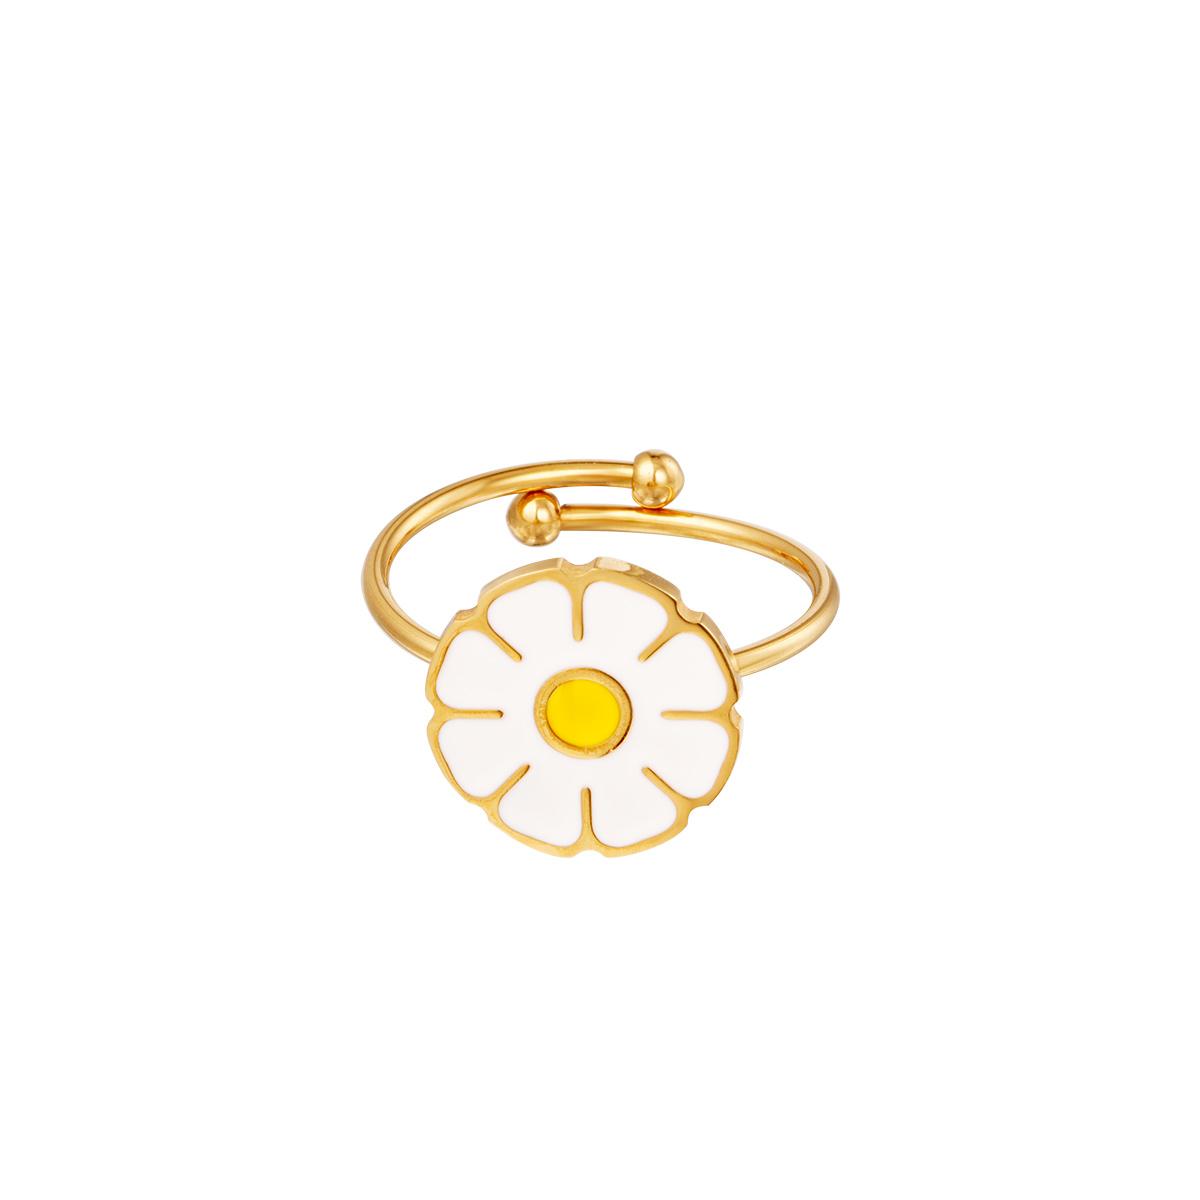 Flor de anillo de acero inoxidable